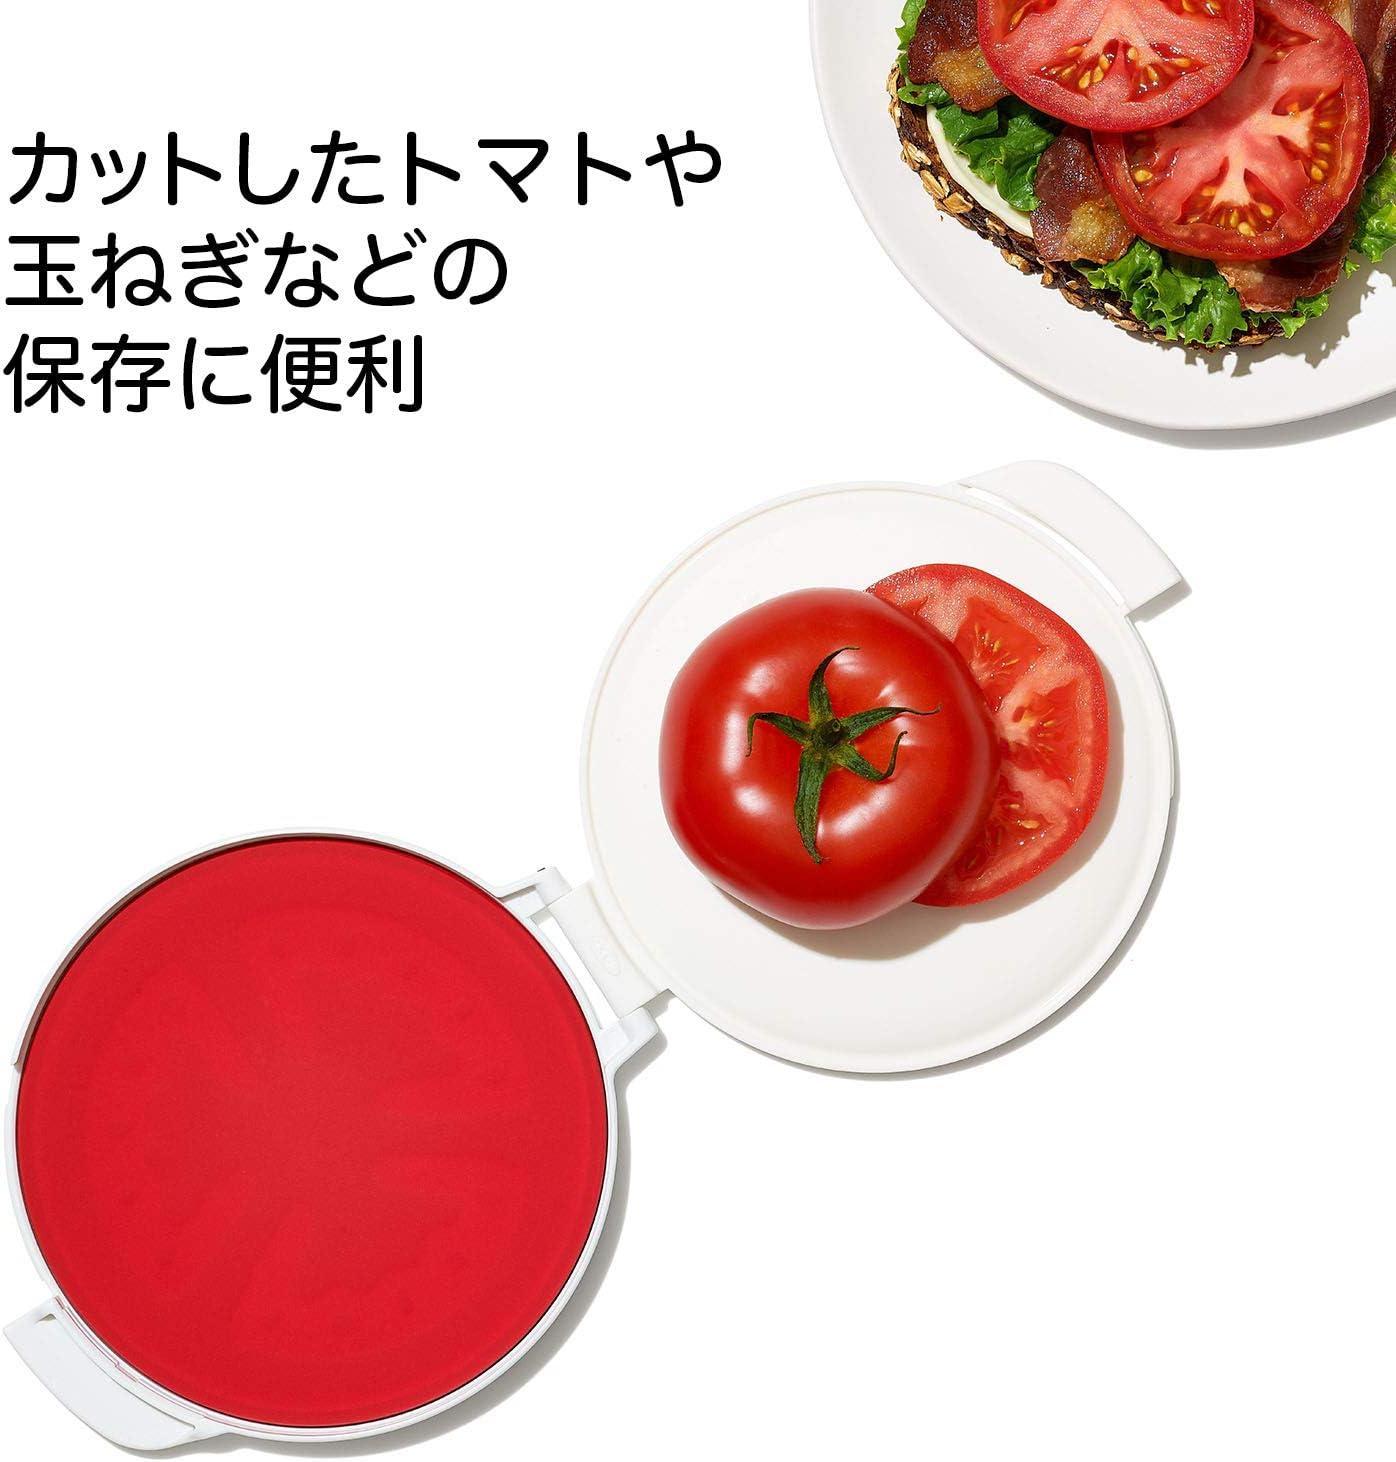 OXO(オクソー)シリコンフードキーパー(トマト)